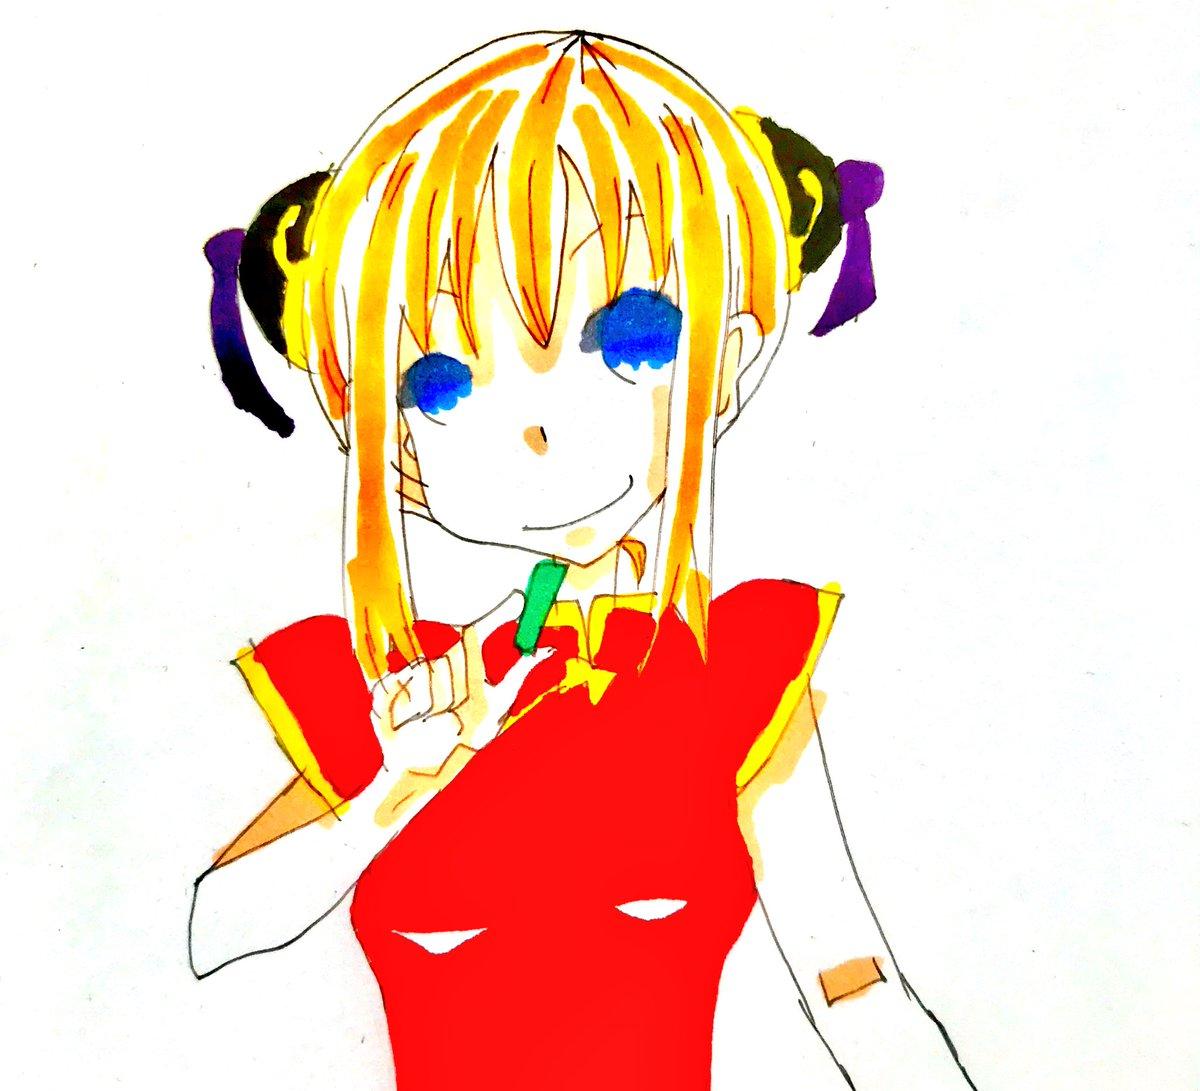 Uzivatel 咲 絵垢 Na Twitteru 銀魂 神楽 イラスト コピック アナログ 神楽可愛い